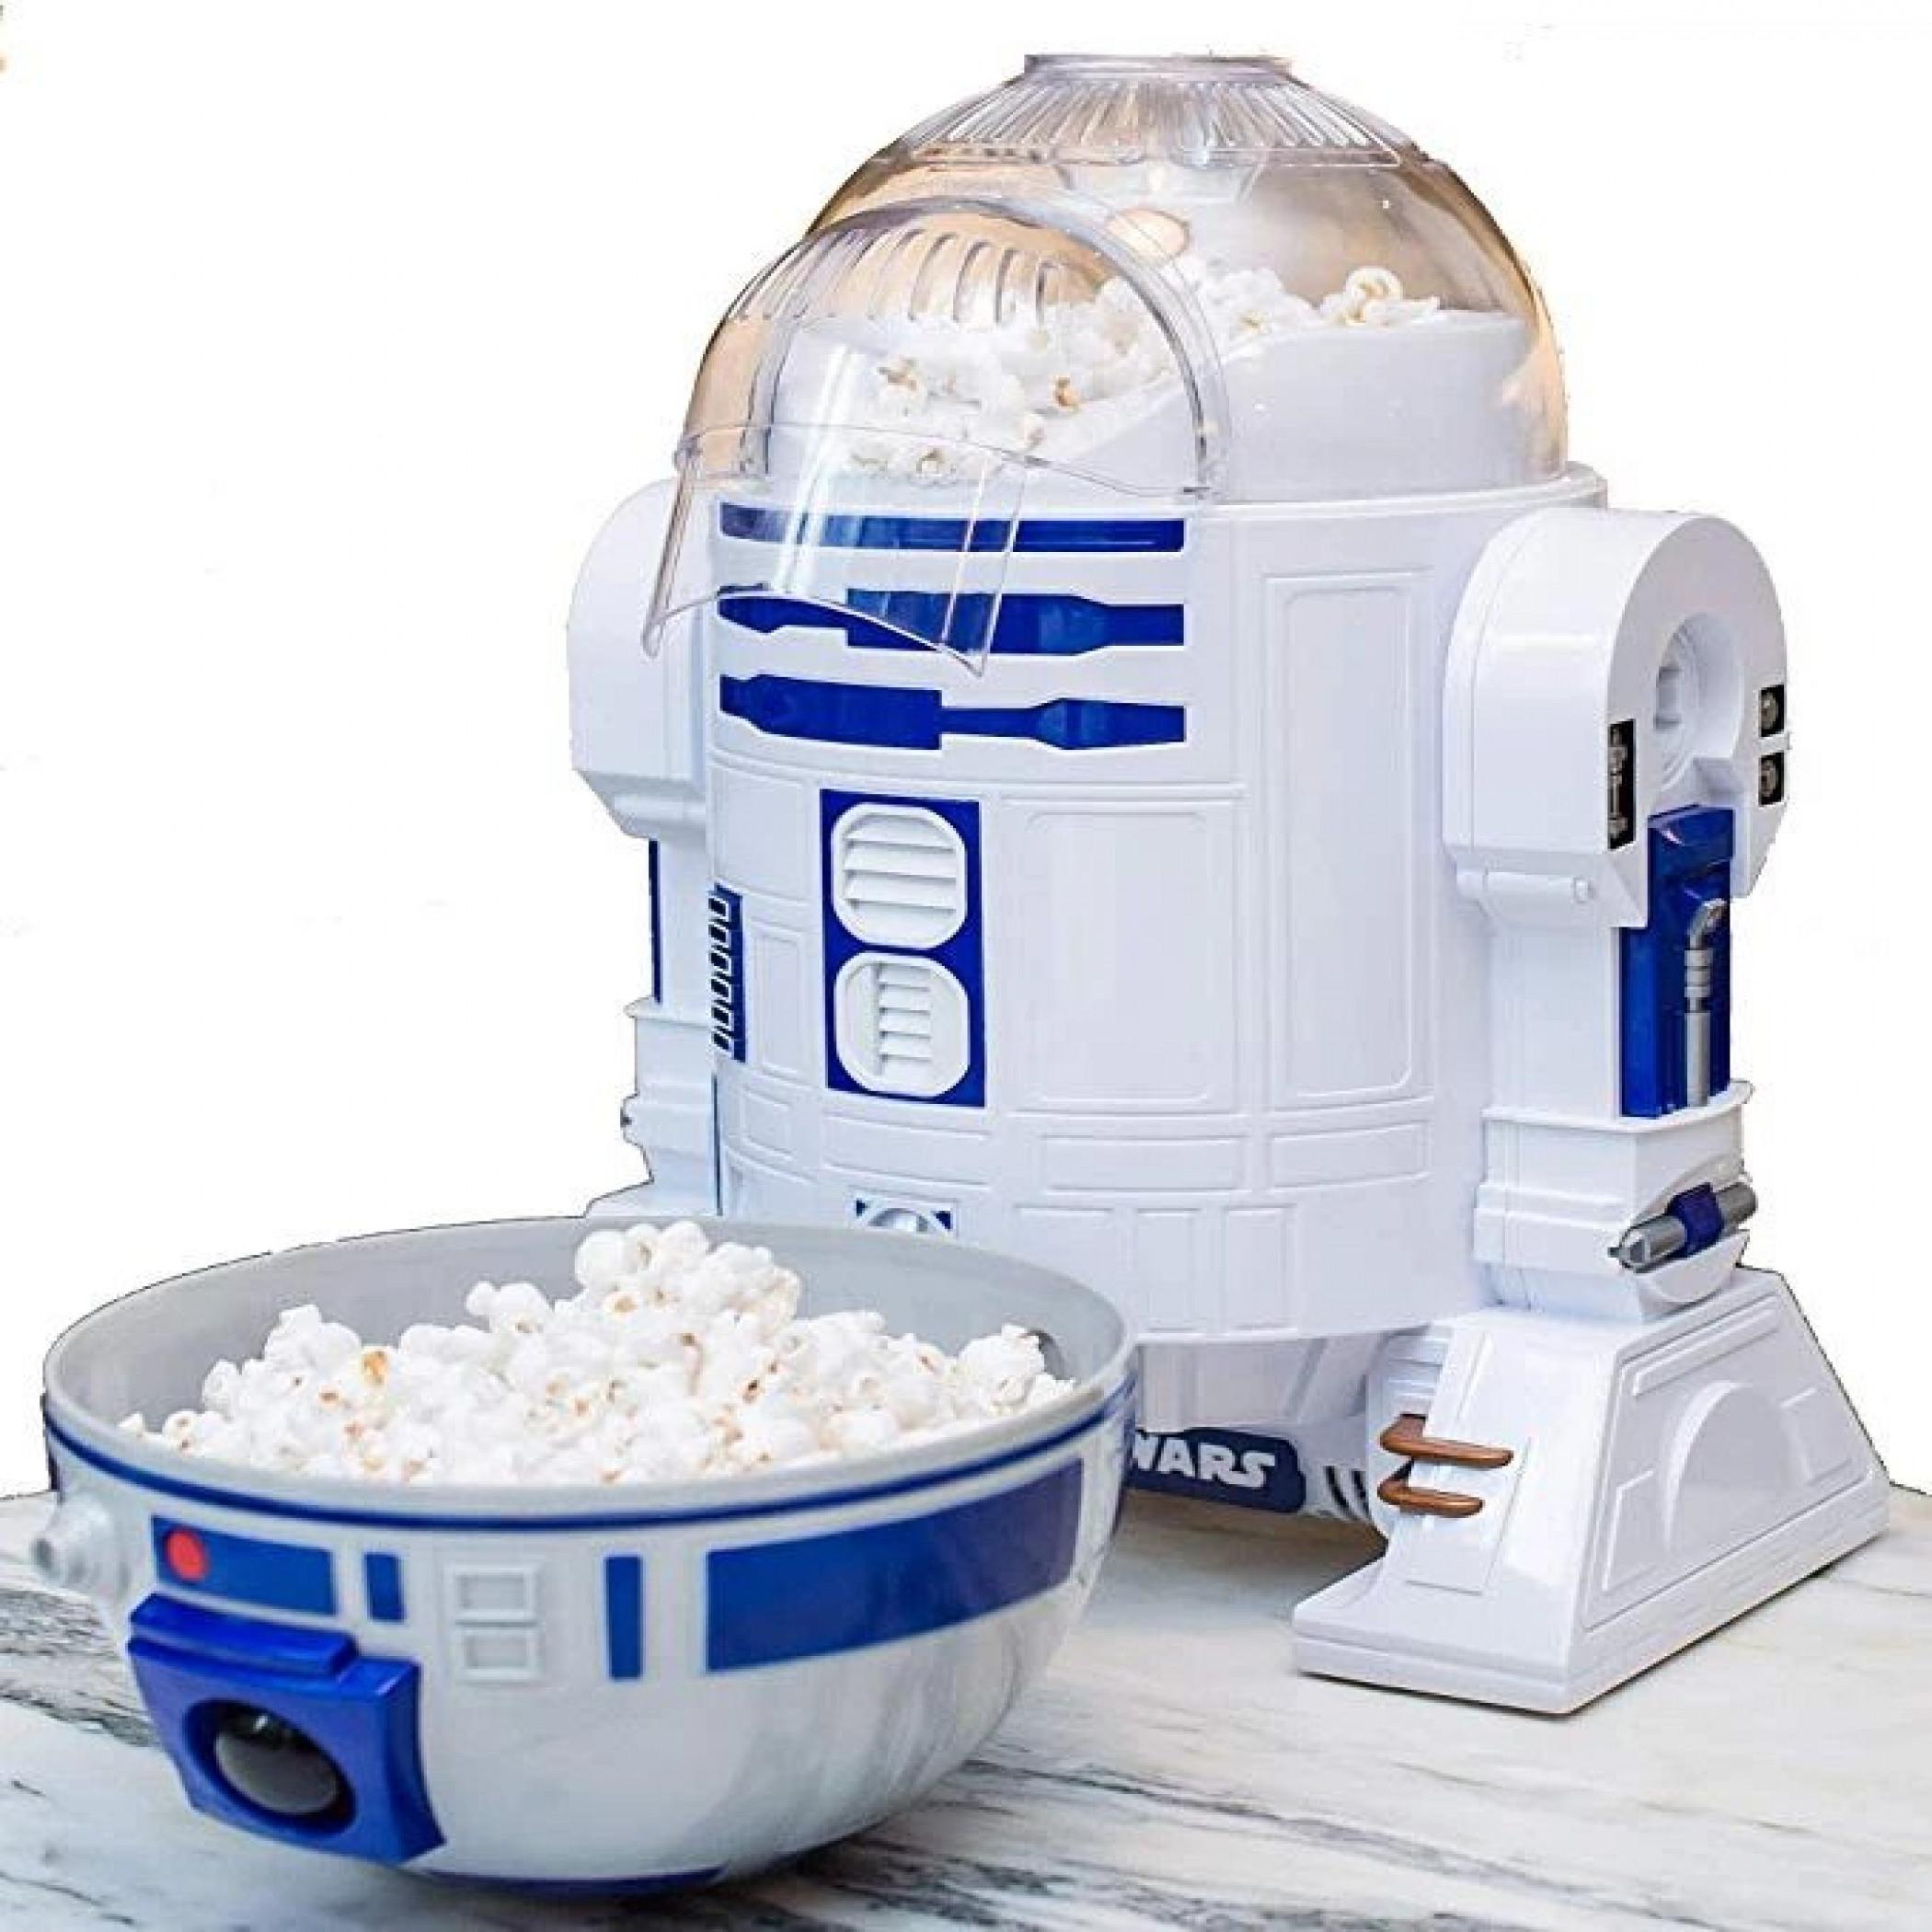 Star Wars R2-D2 Popcorn Maker